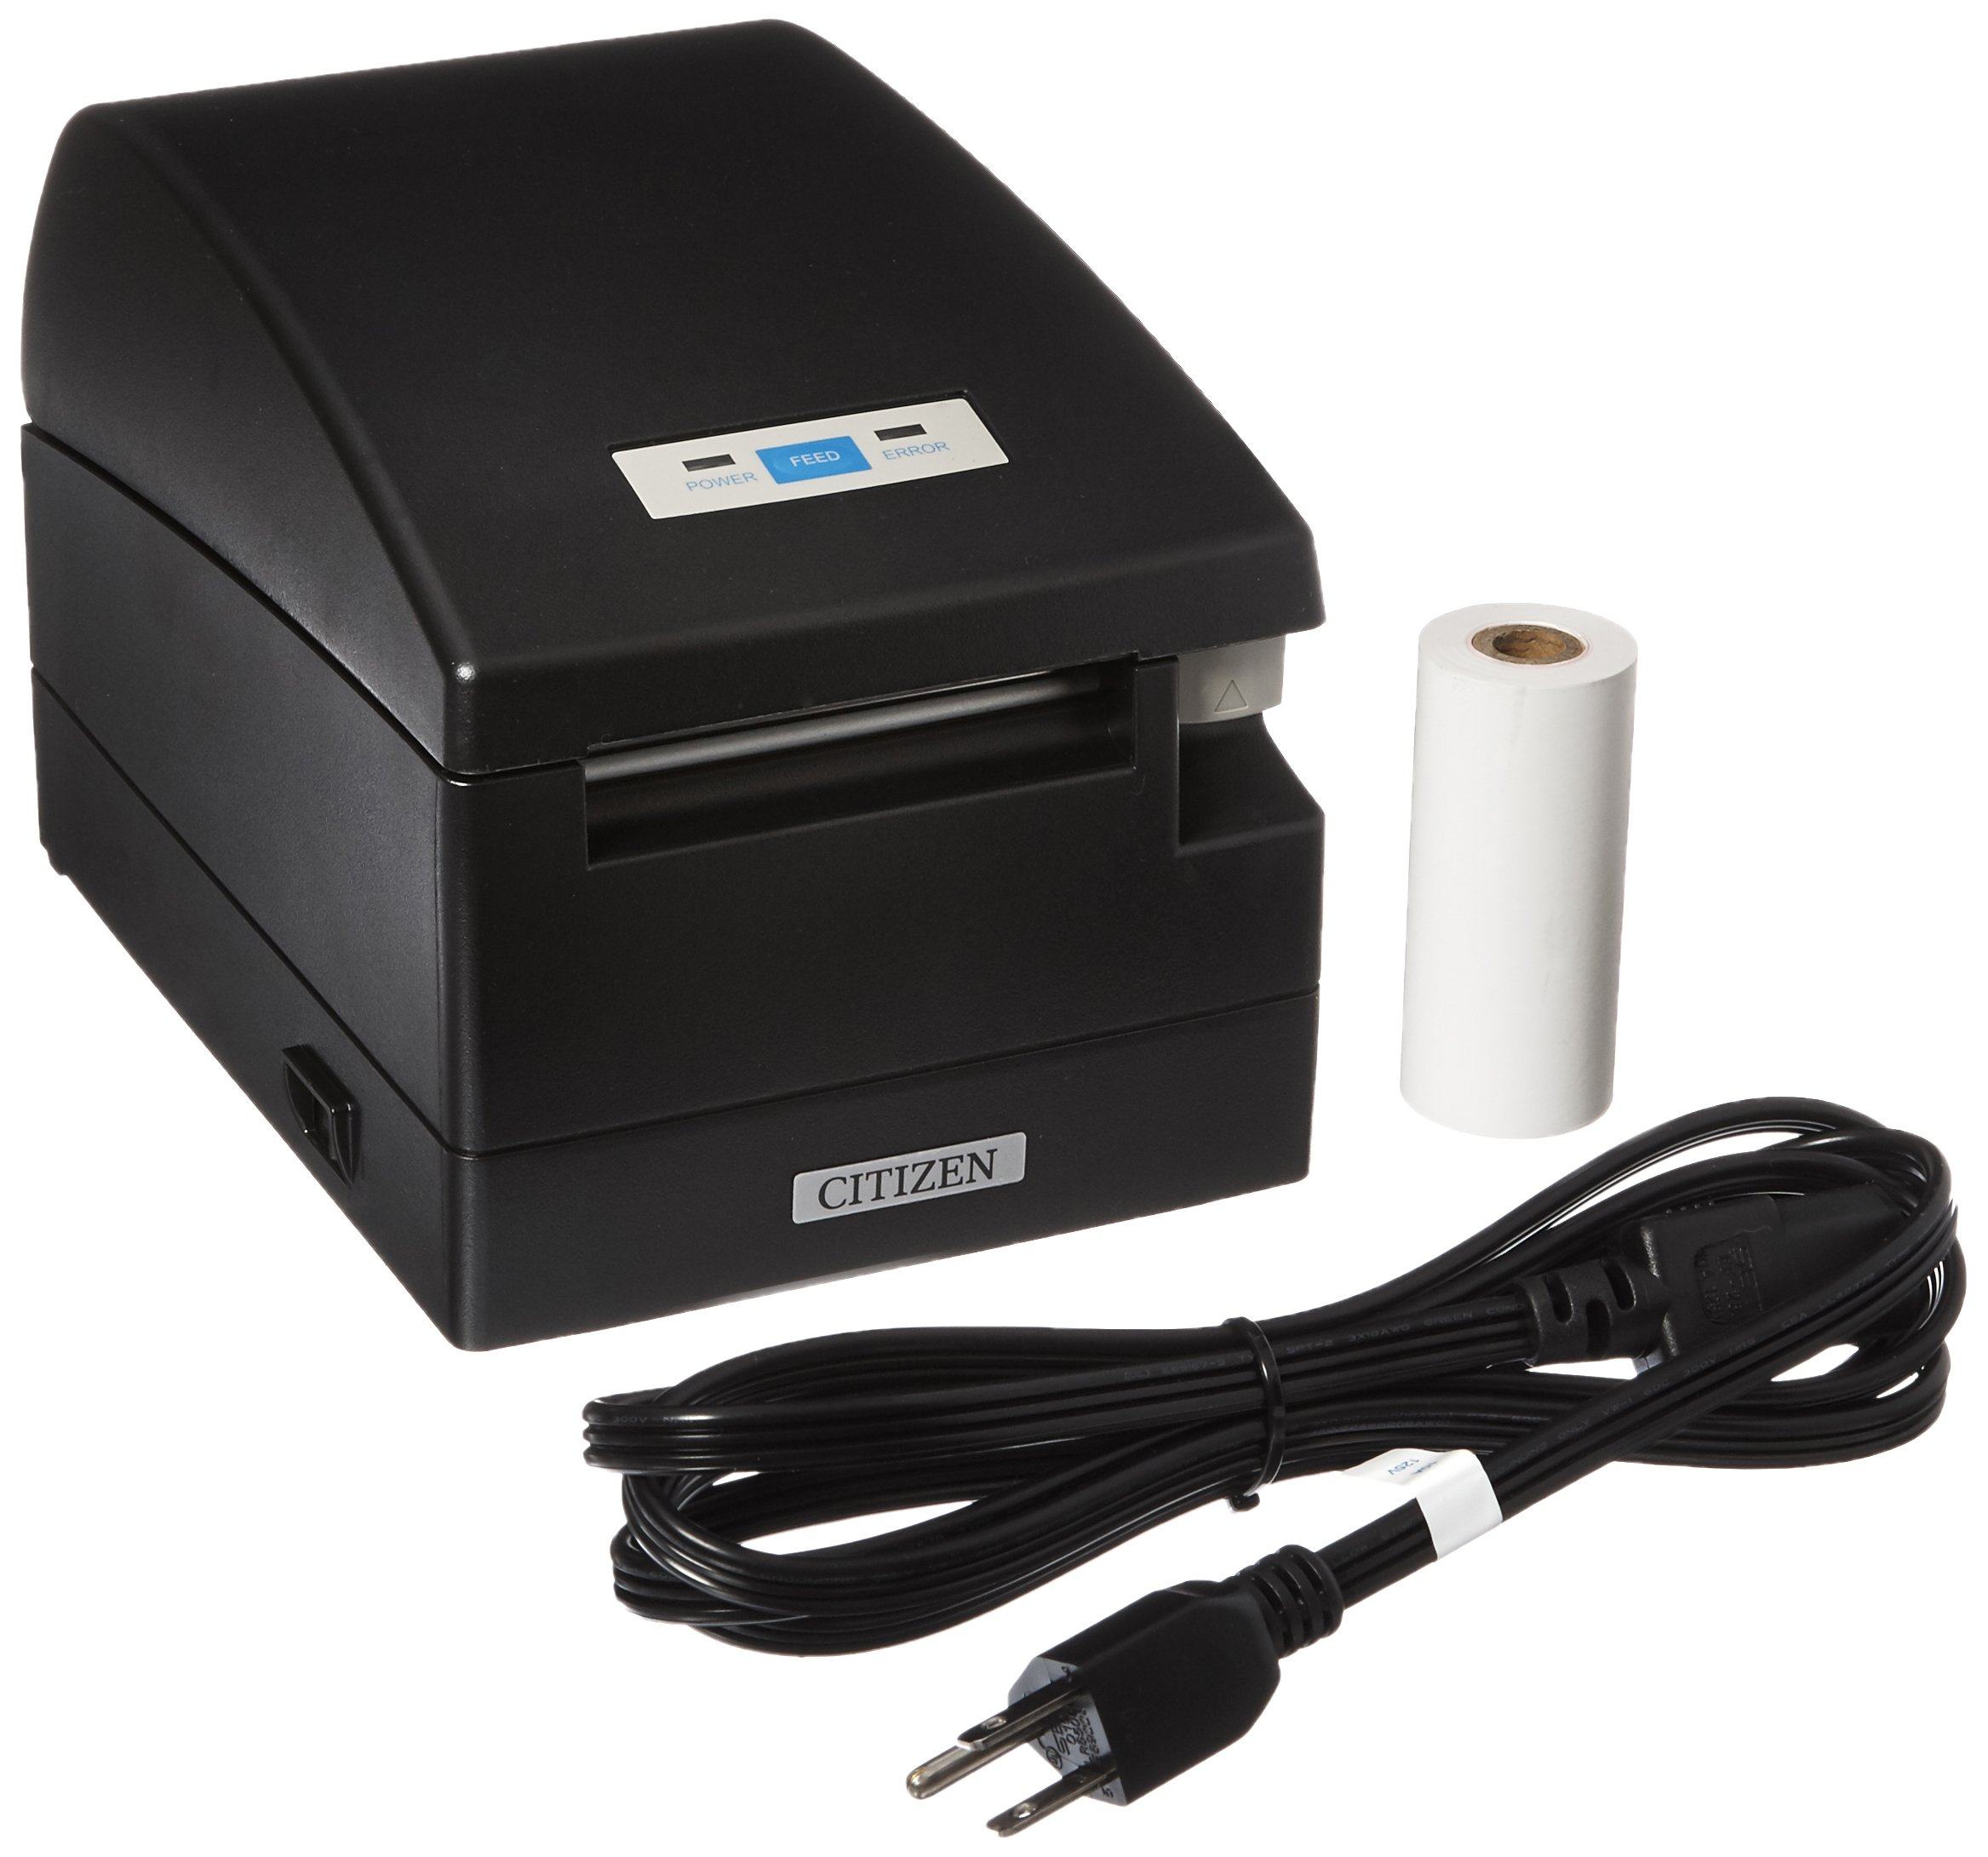 Citizen America CT-S2000UBU-BK CT-S2000 Series Hi-Speed POS Thermal Printer, 220 mm/Sec Print Speed, 42 Columns, USB, Internal Power Supply, Black